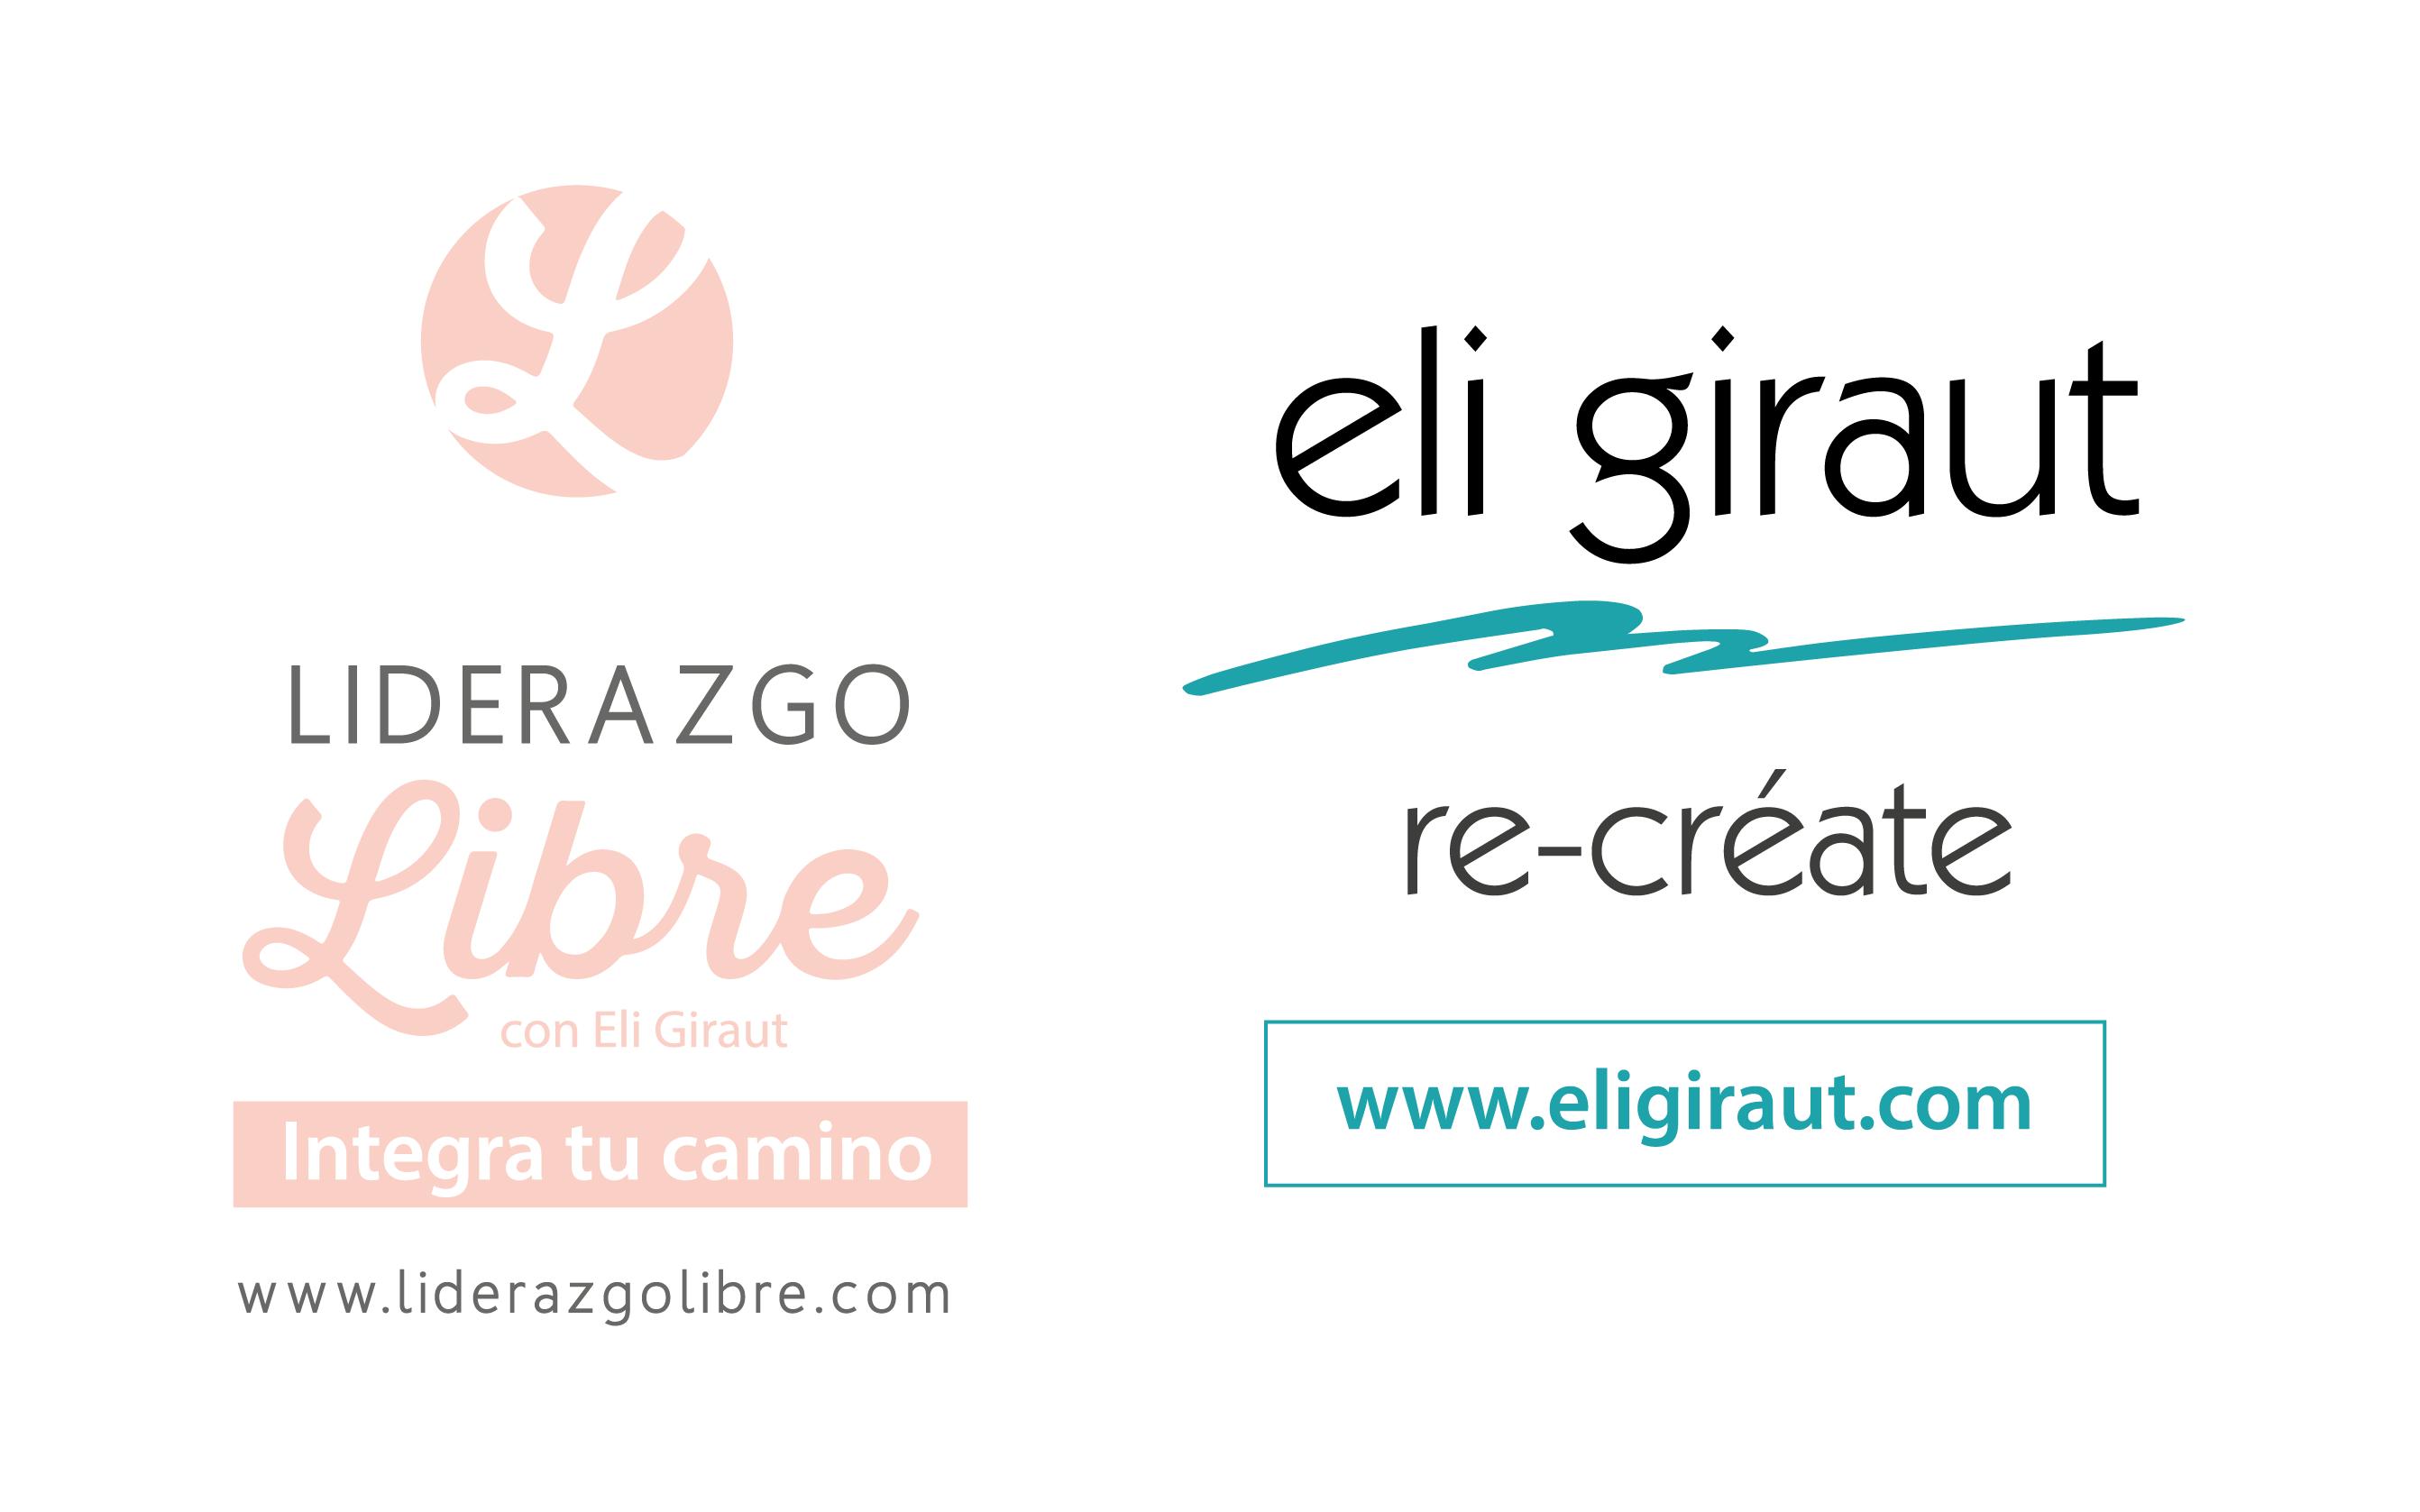 Eli Giraut - Coaching - Liderazgo Libre